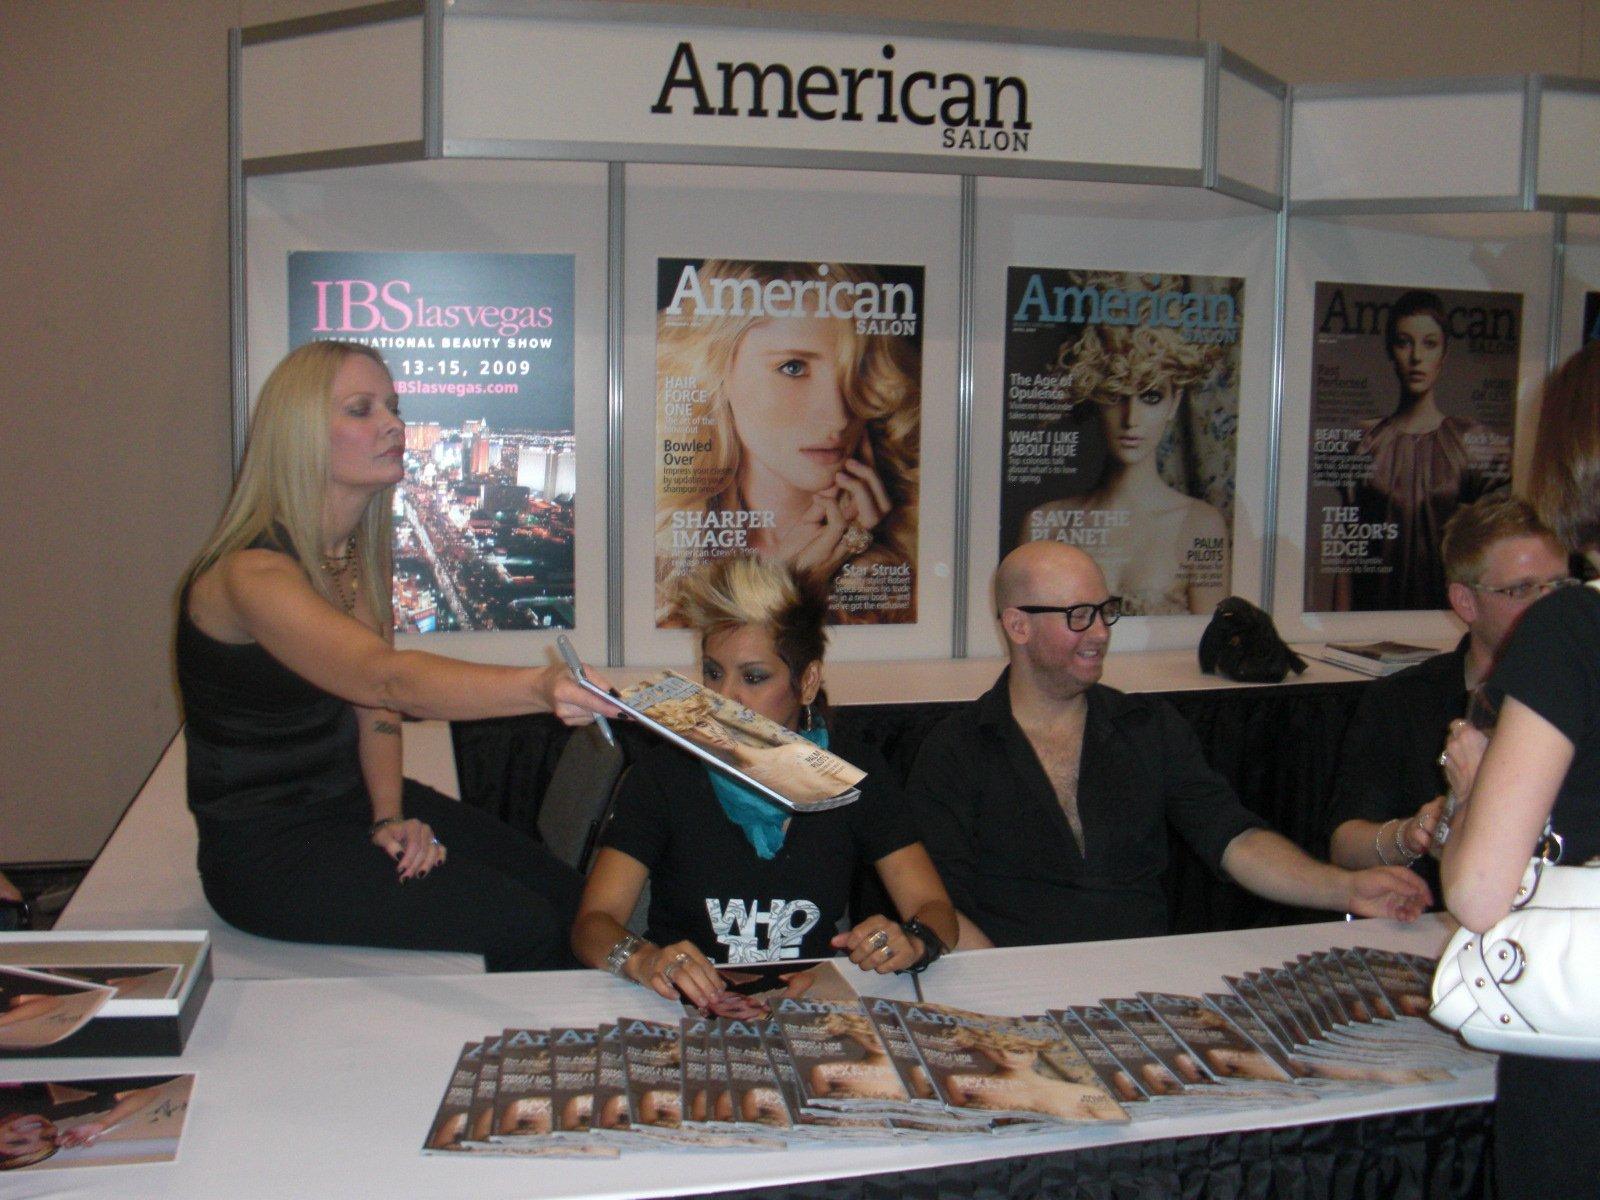 Glenn, Dee and Charlie sign autographs